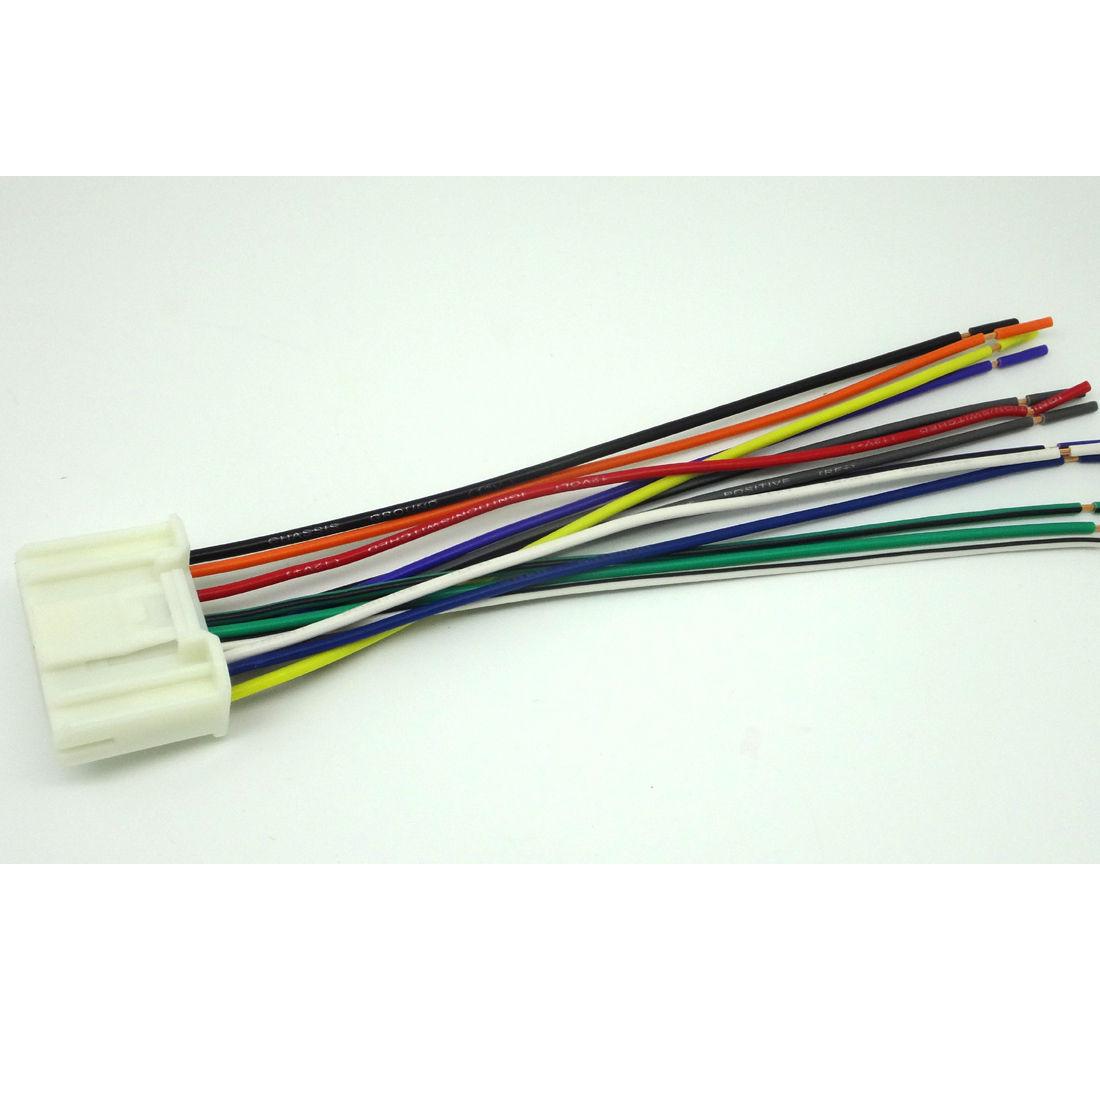 2010 subaru impreza stereo wiring diagram wiring diagram 1996 subaru impreza stereo wiring image about 2007 subaru impreza radio wiring harness stereo diagram source